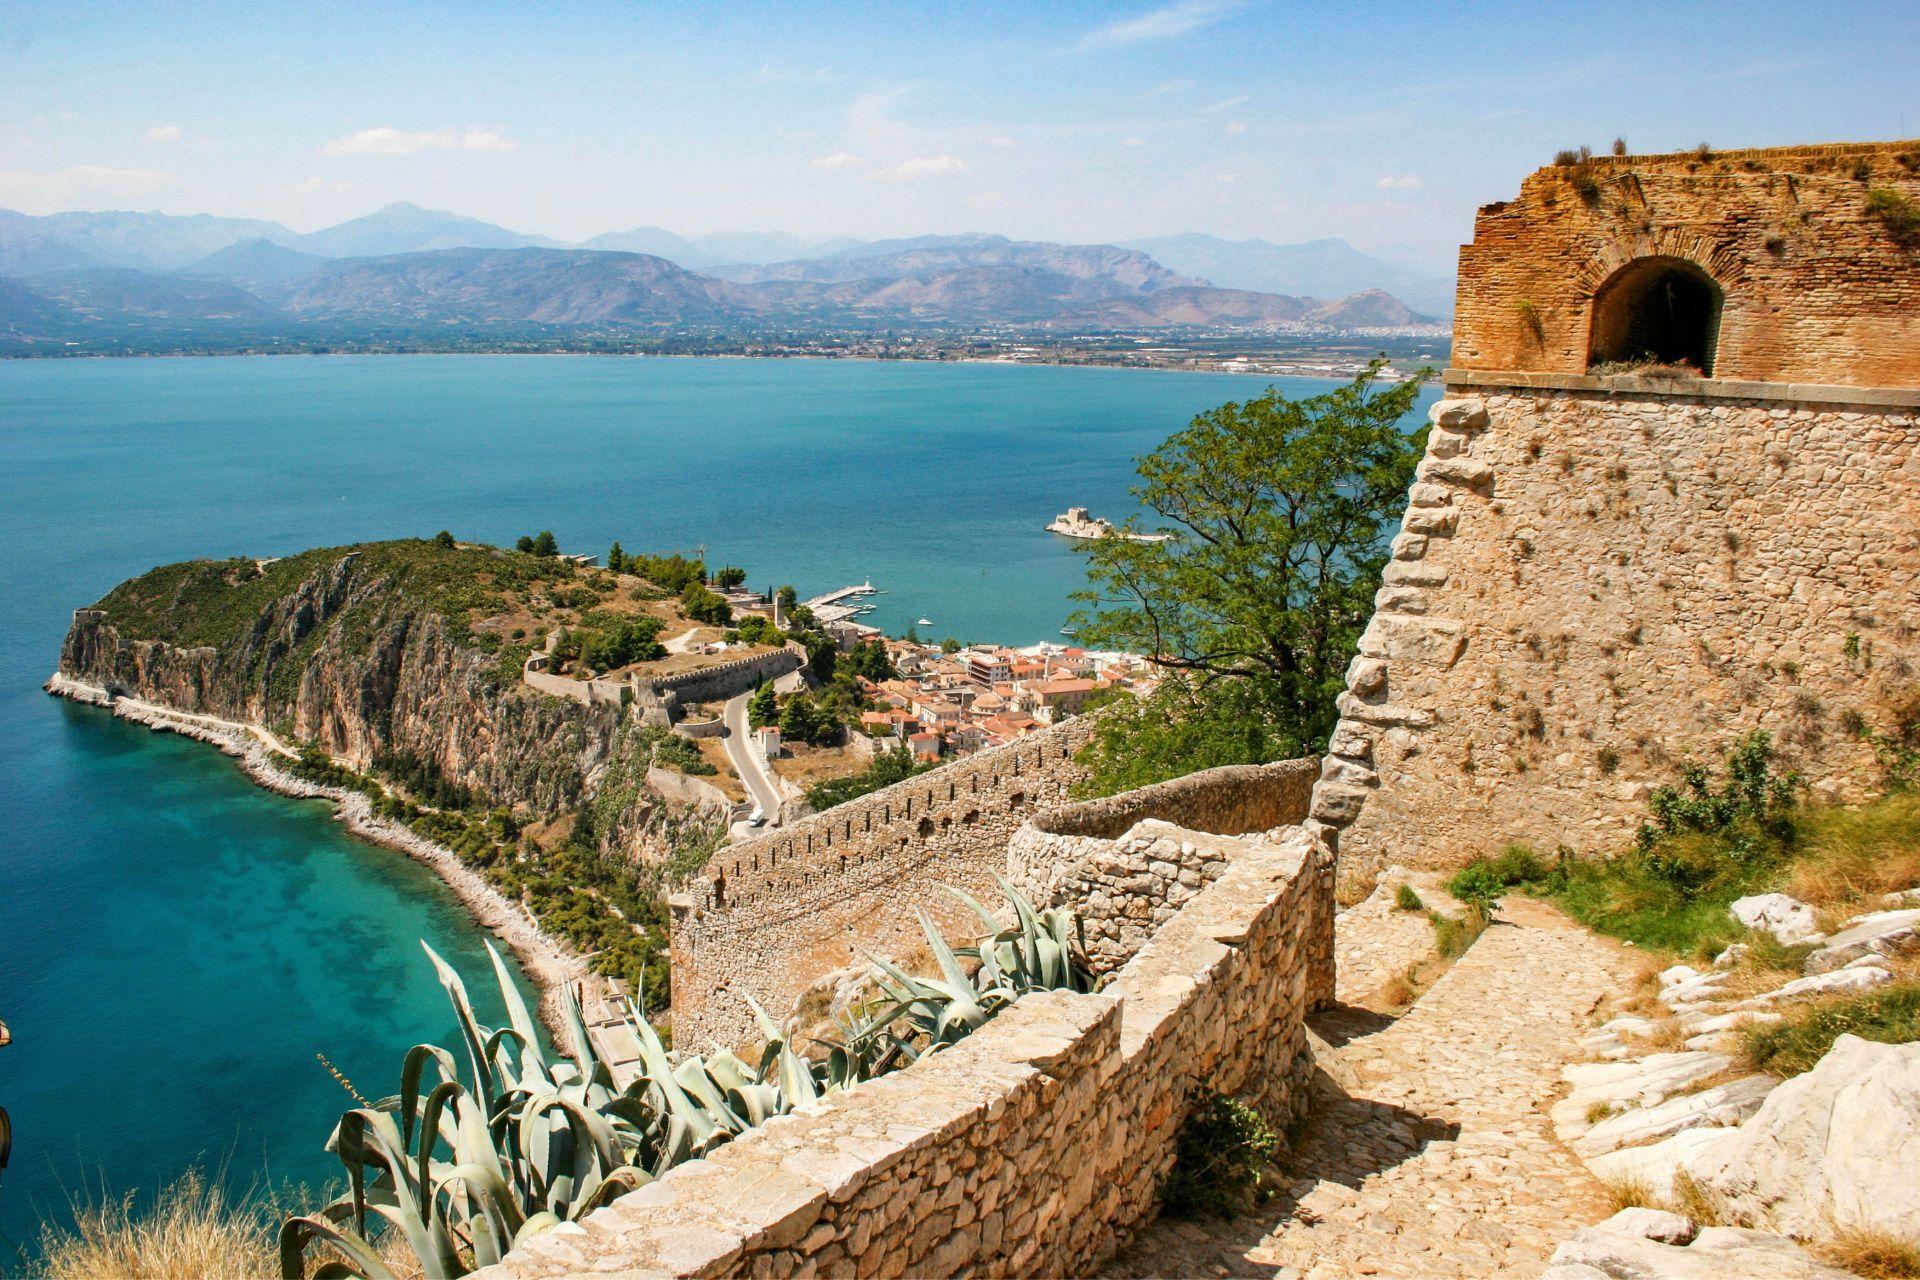 Nafplion: Palamidi fortress